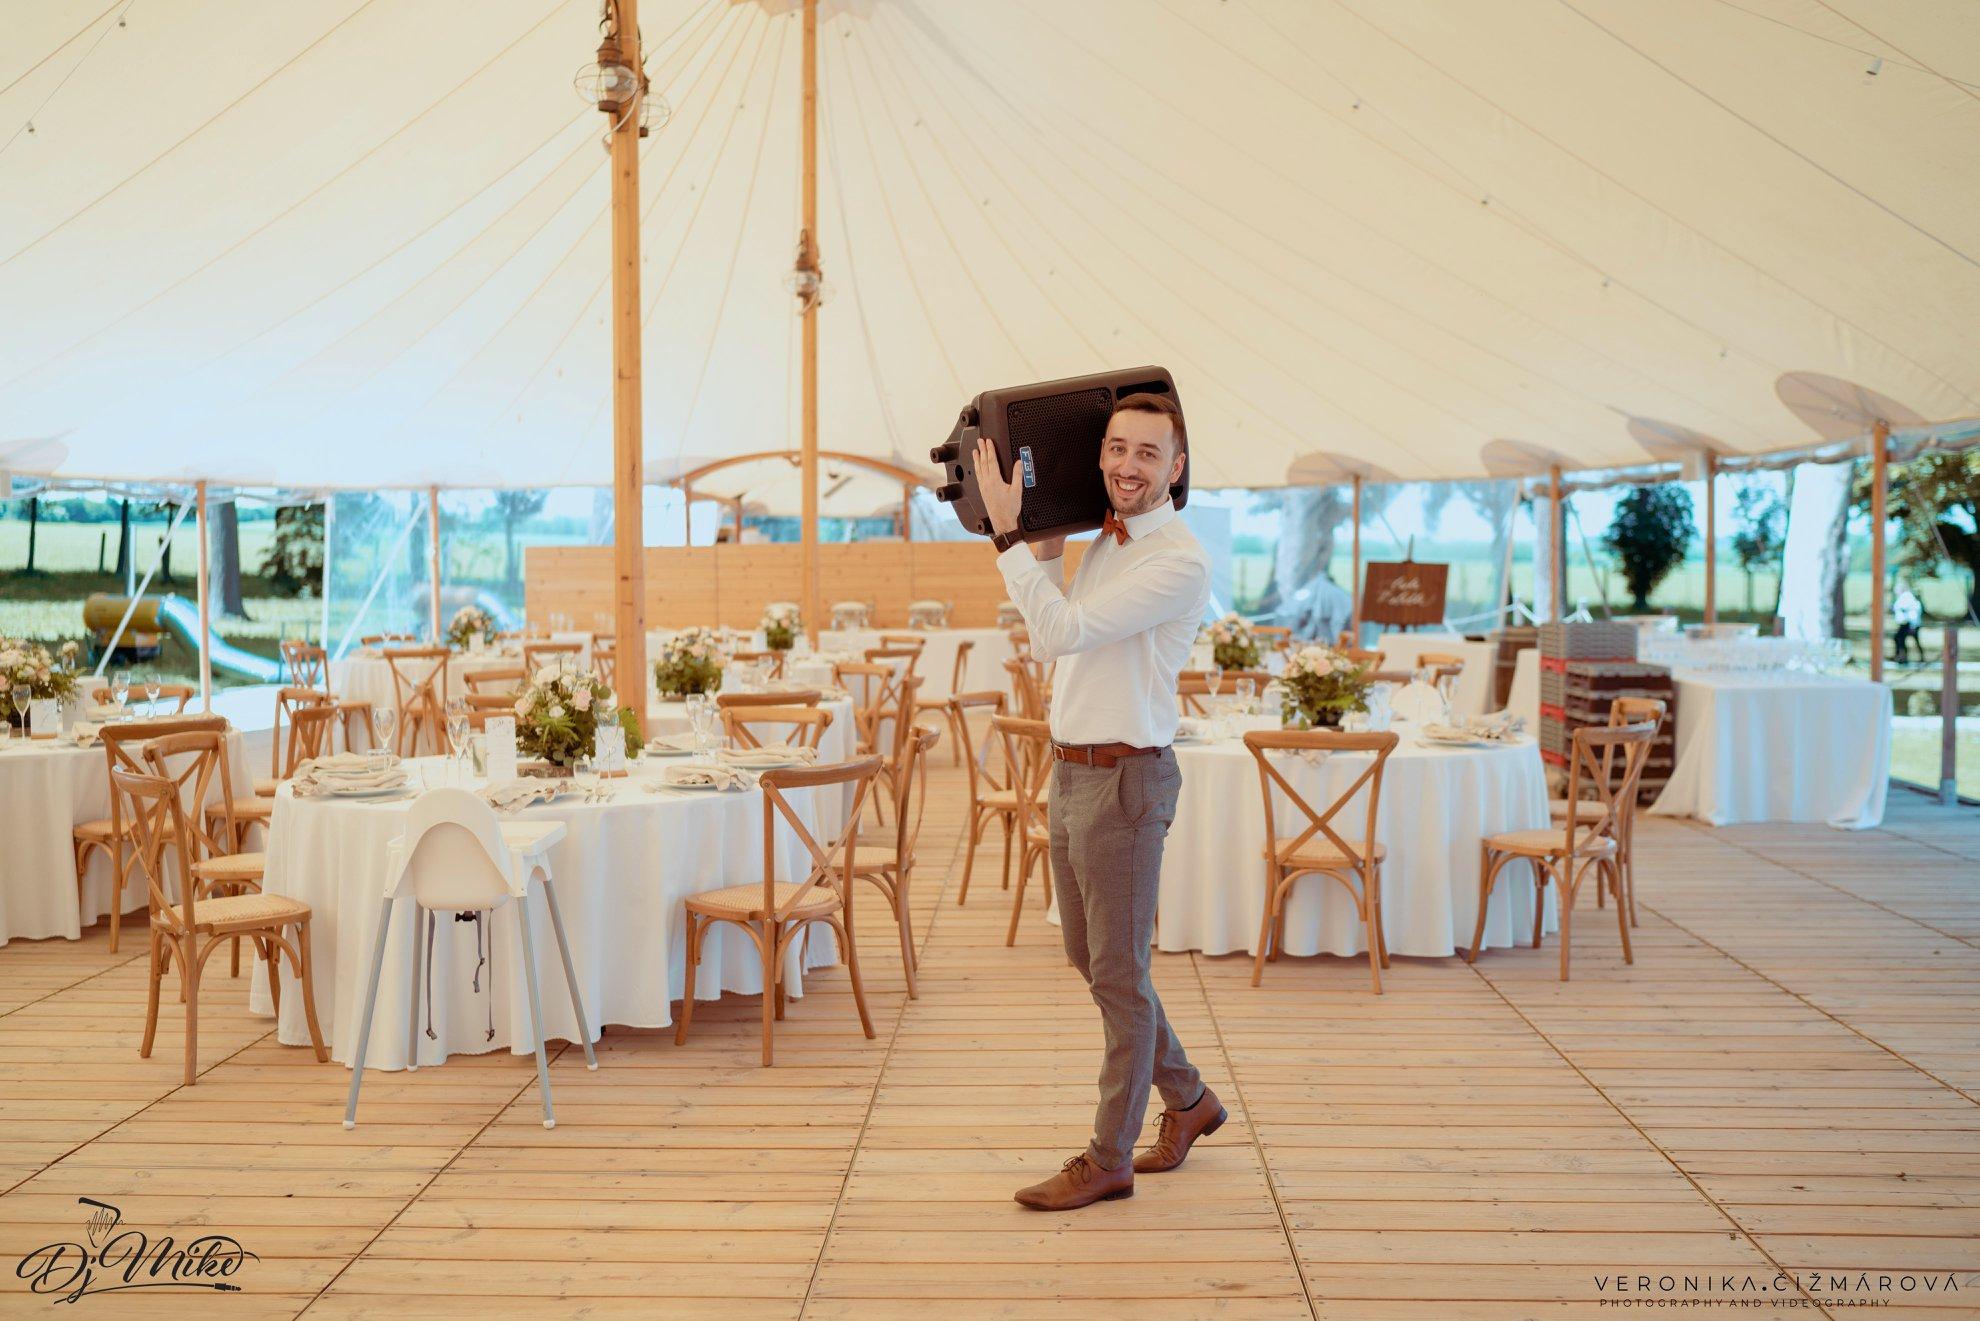 boho-svadba-wedding-dj-moderator-starejsijpg